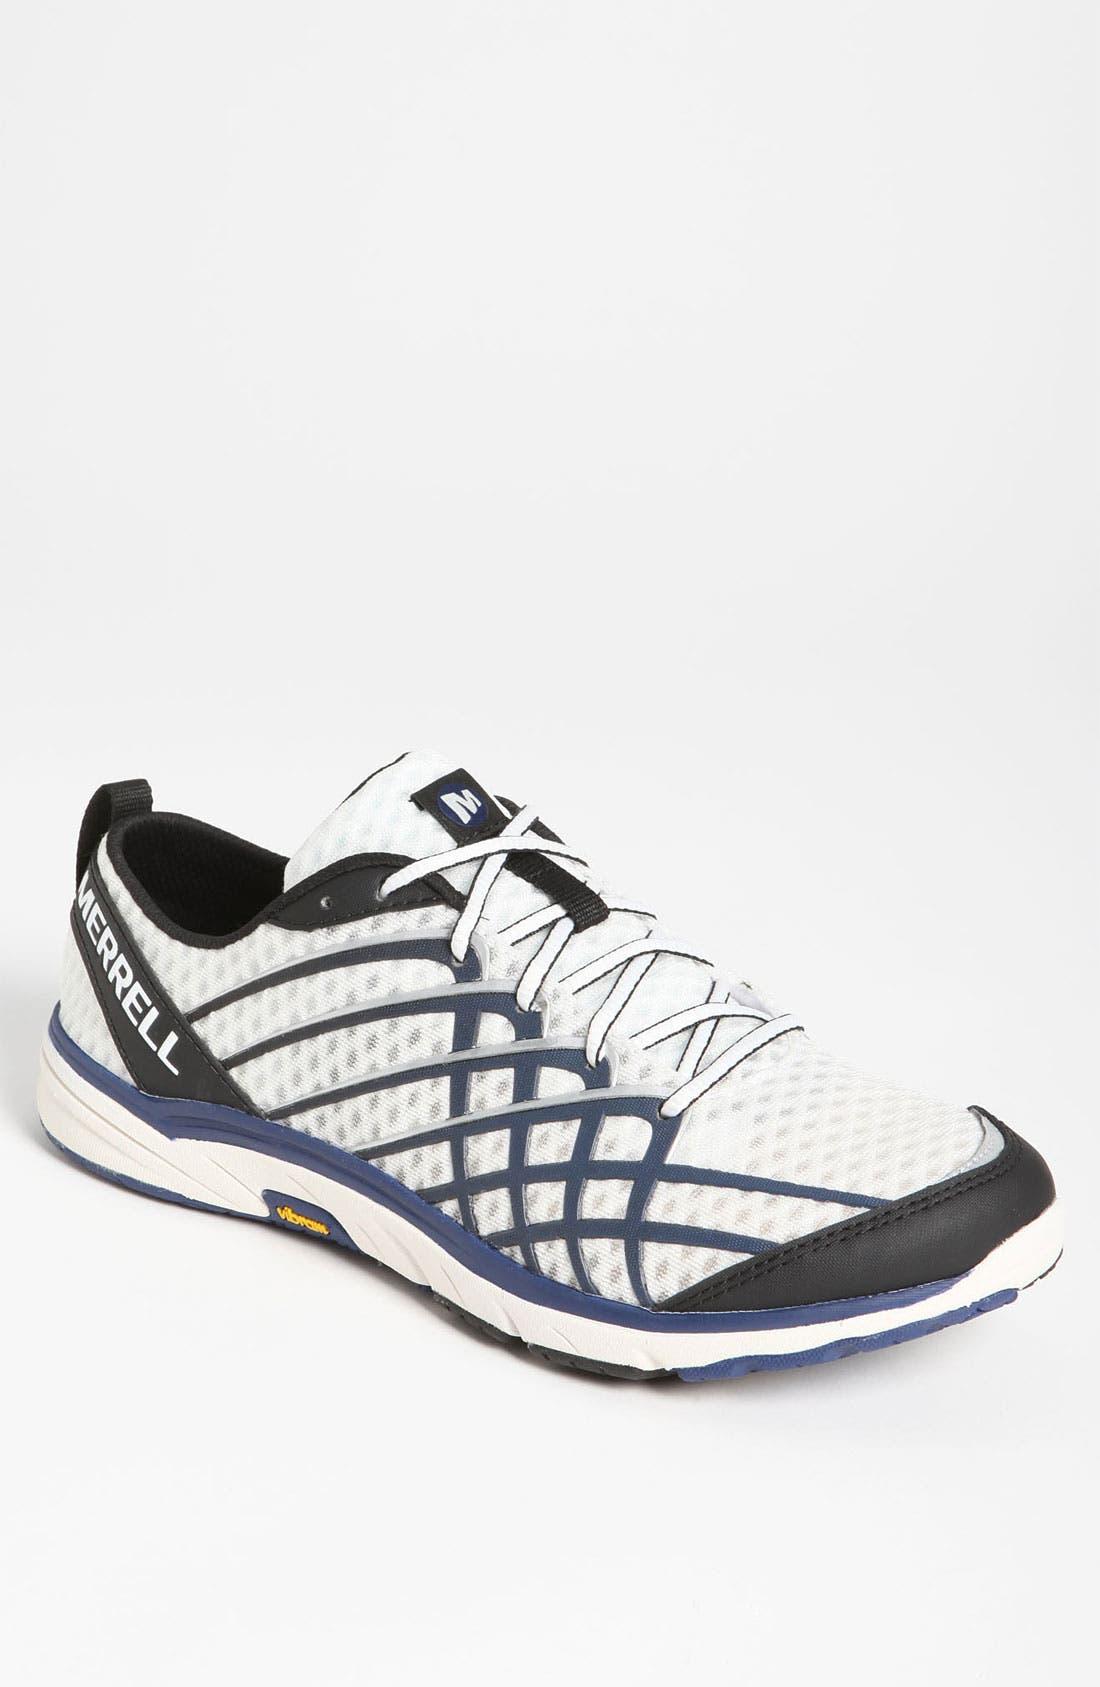 Main Image - Merrell 'Bare Access' Running Shoe (Men)